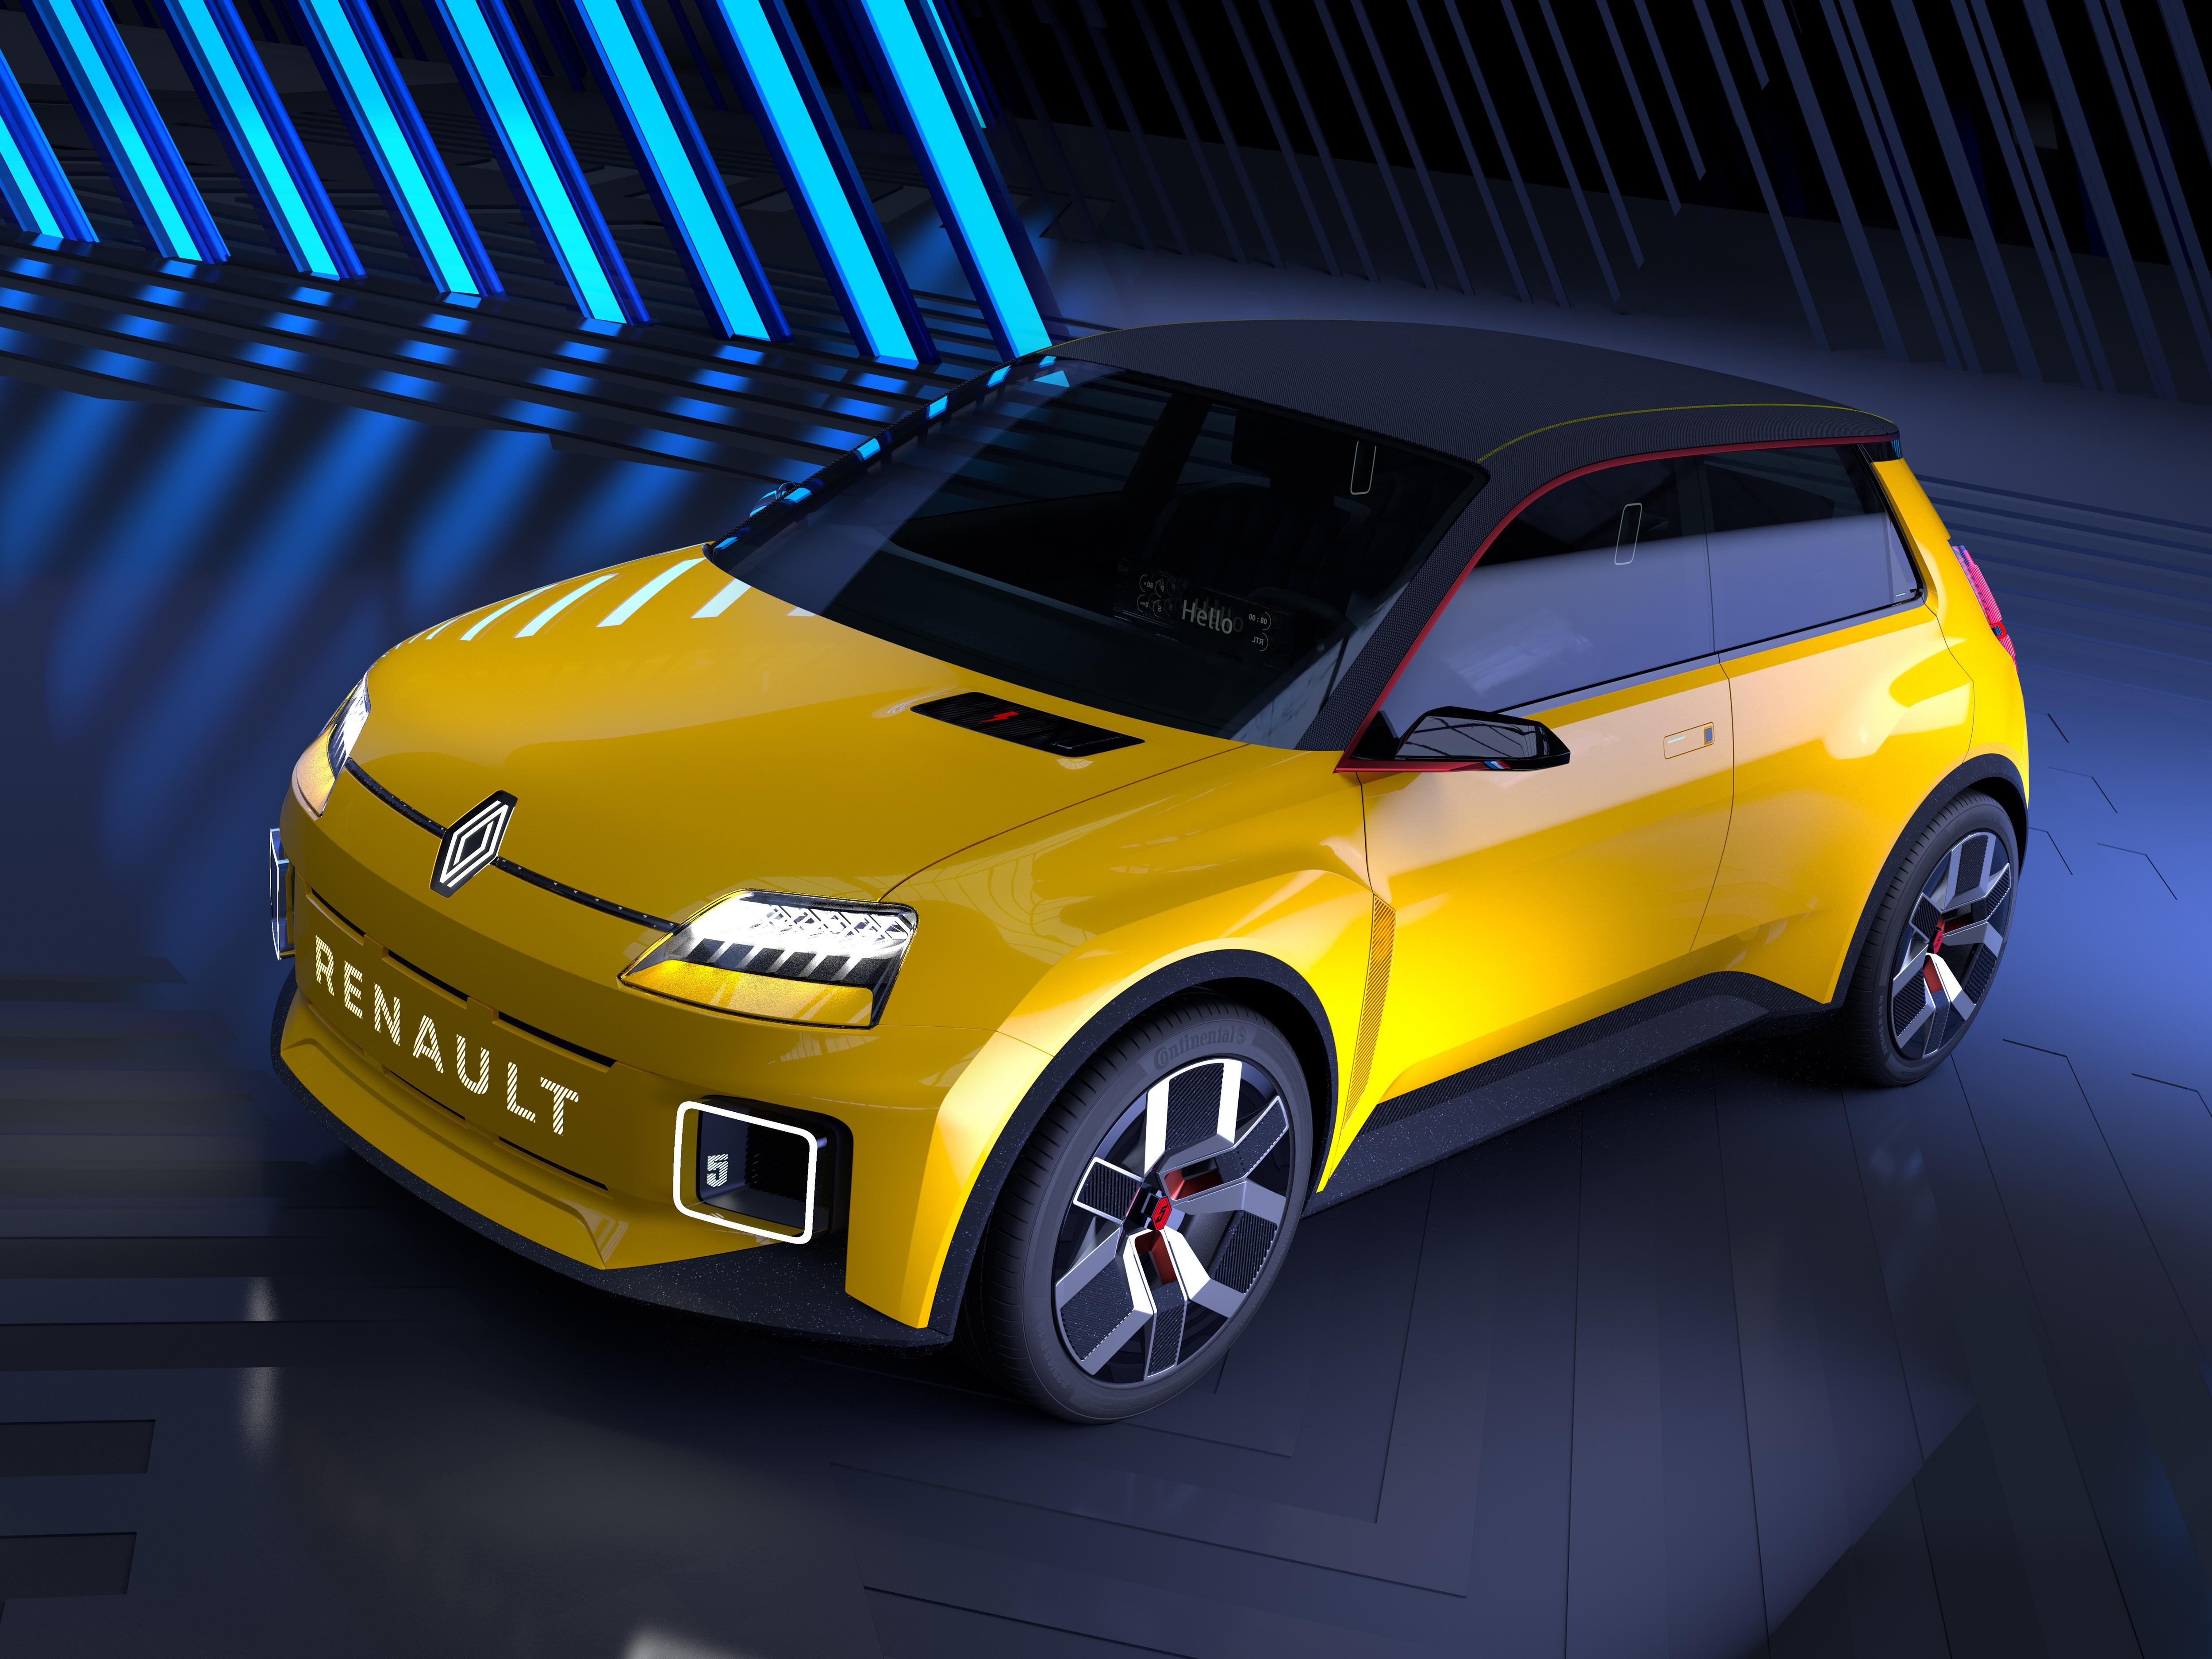 Renault 5 Concept